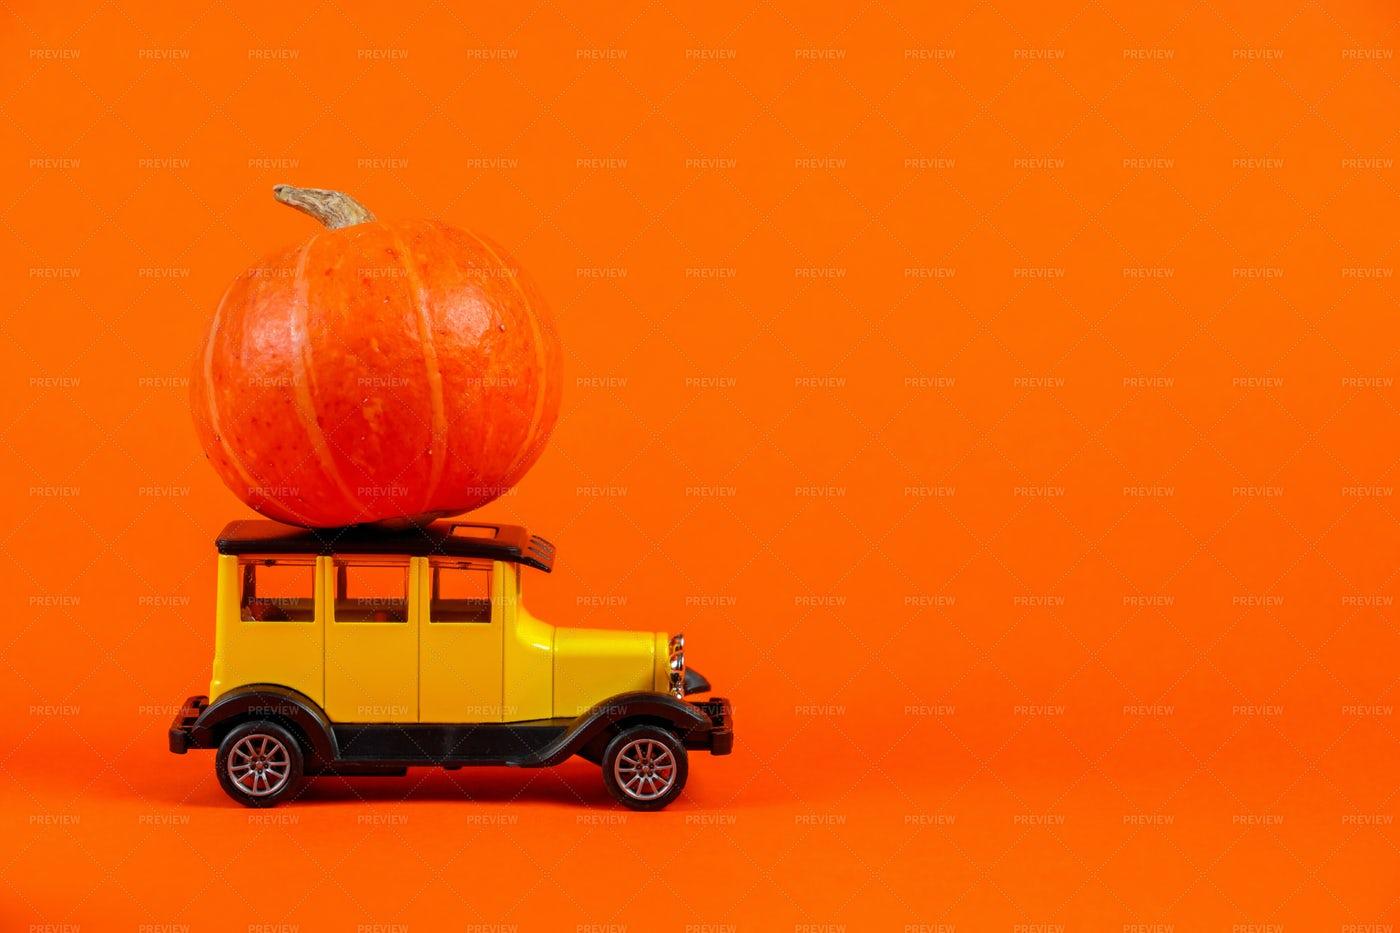 Retro Toy Car With Pumpkin: Stock Photos